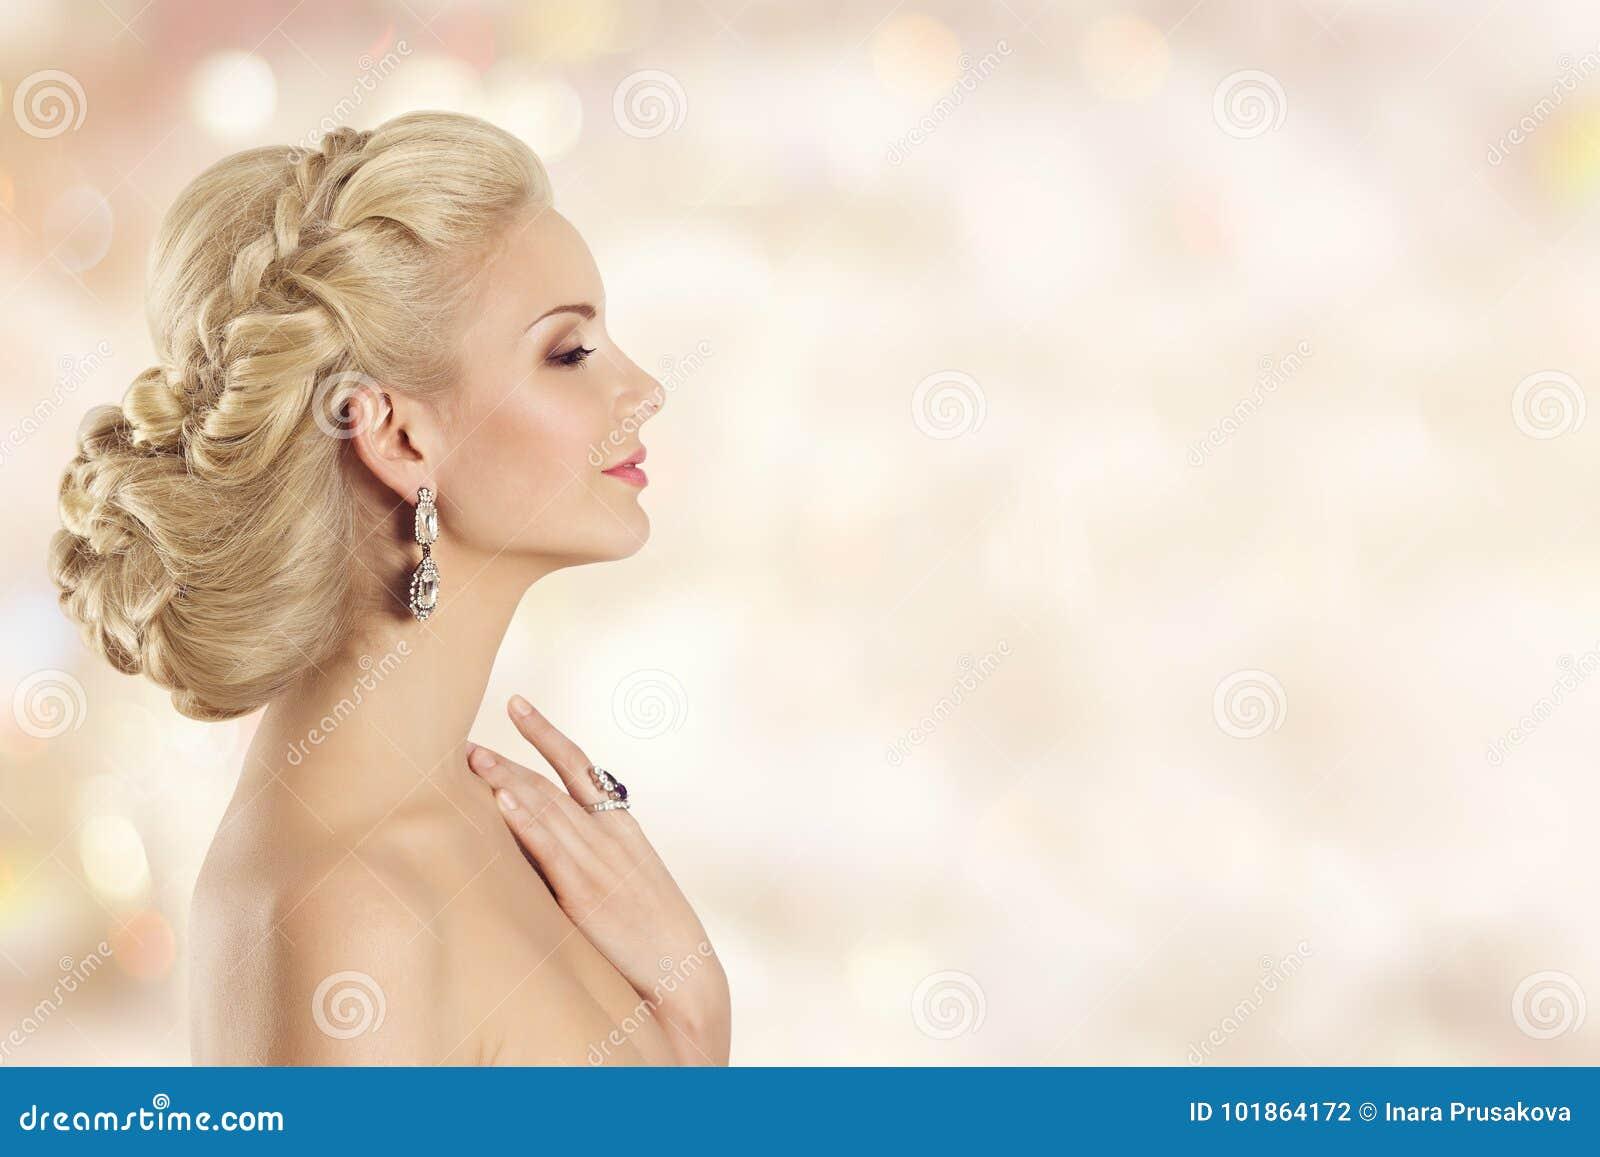 Fashion Model Profile Beauty Elegant Woman Hairstyle Portrait Stock